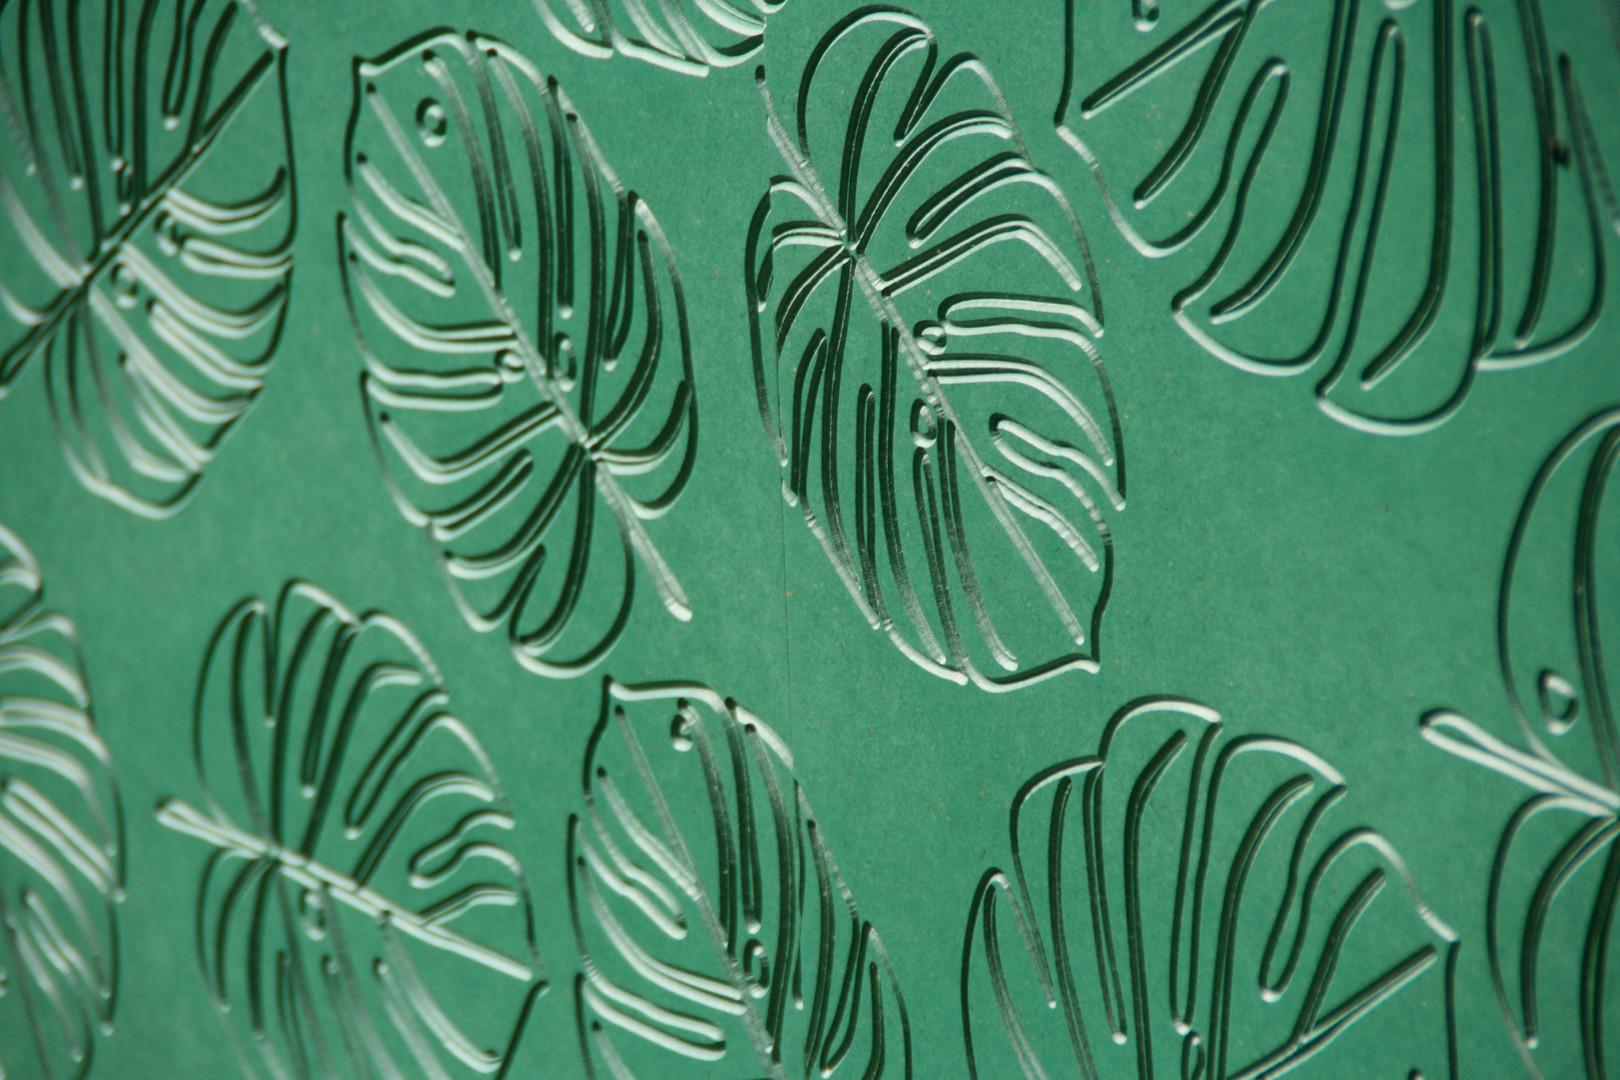 Portes valchromat vert avec motif